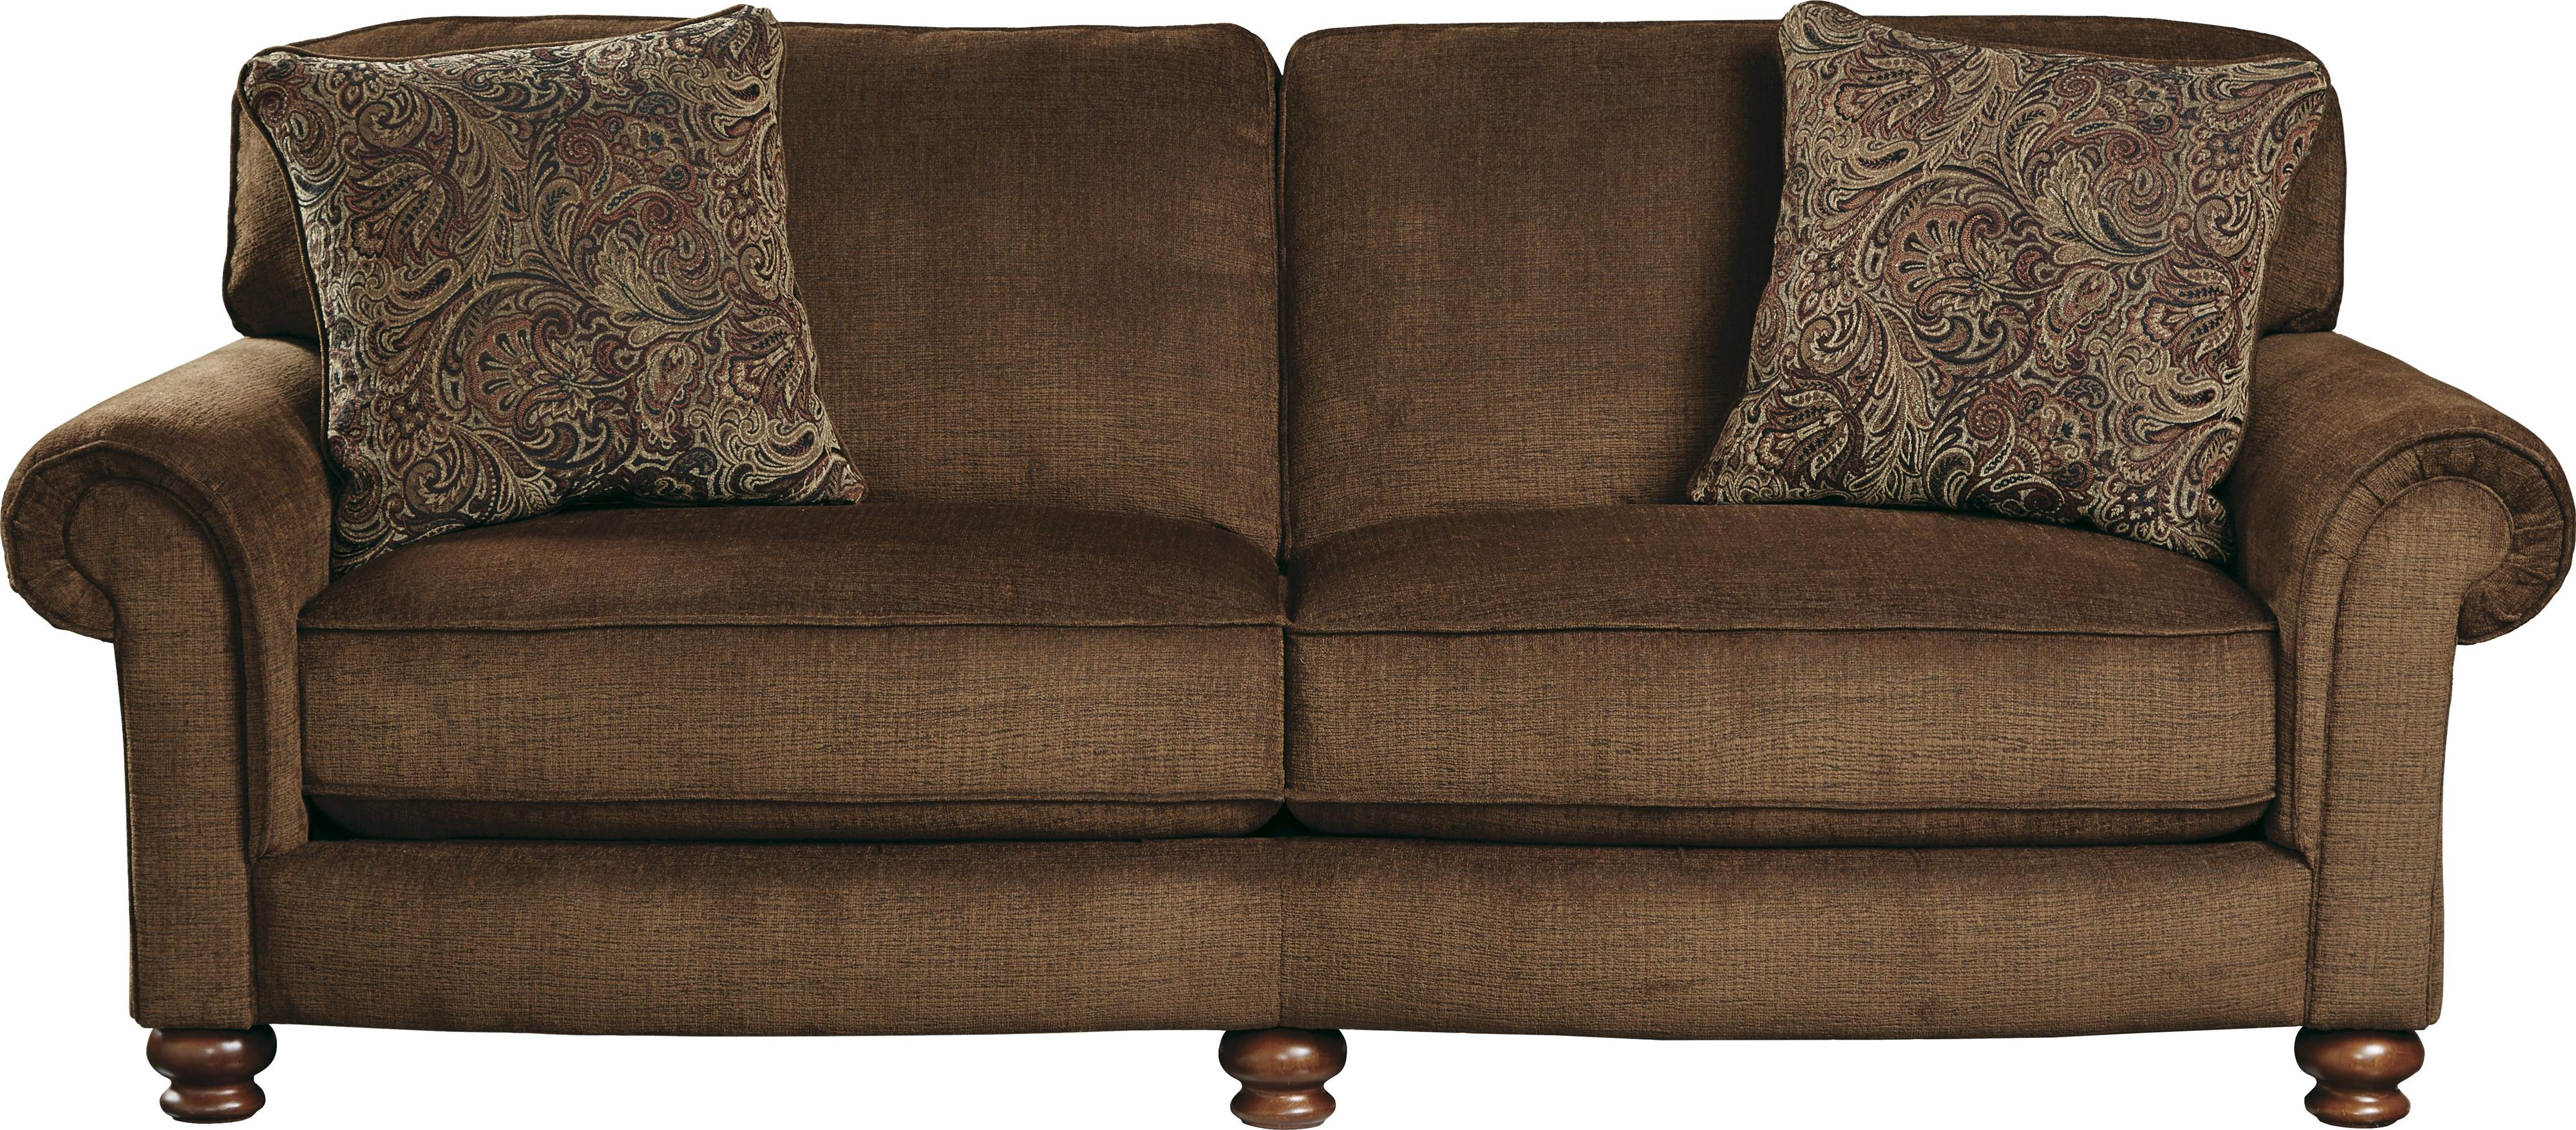 Jackson Furniture Sinclar Sofa  - Item Number: 4384-03-2906-59